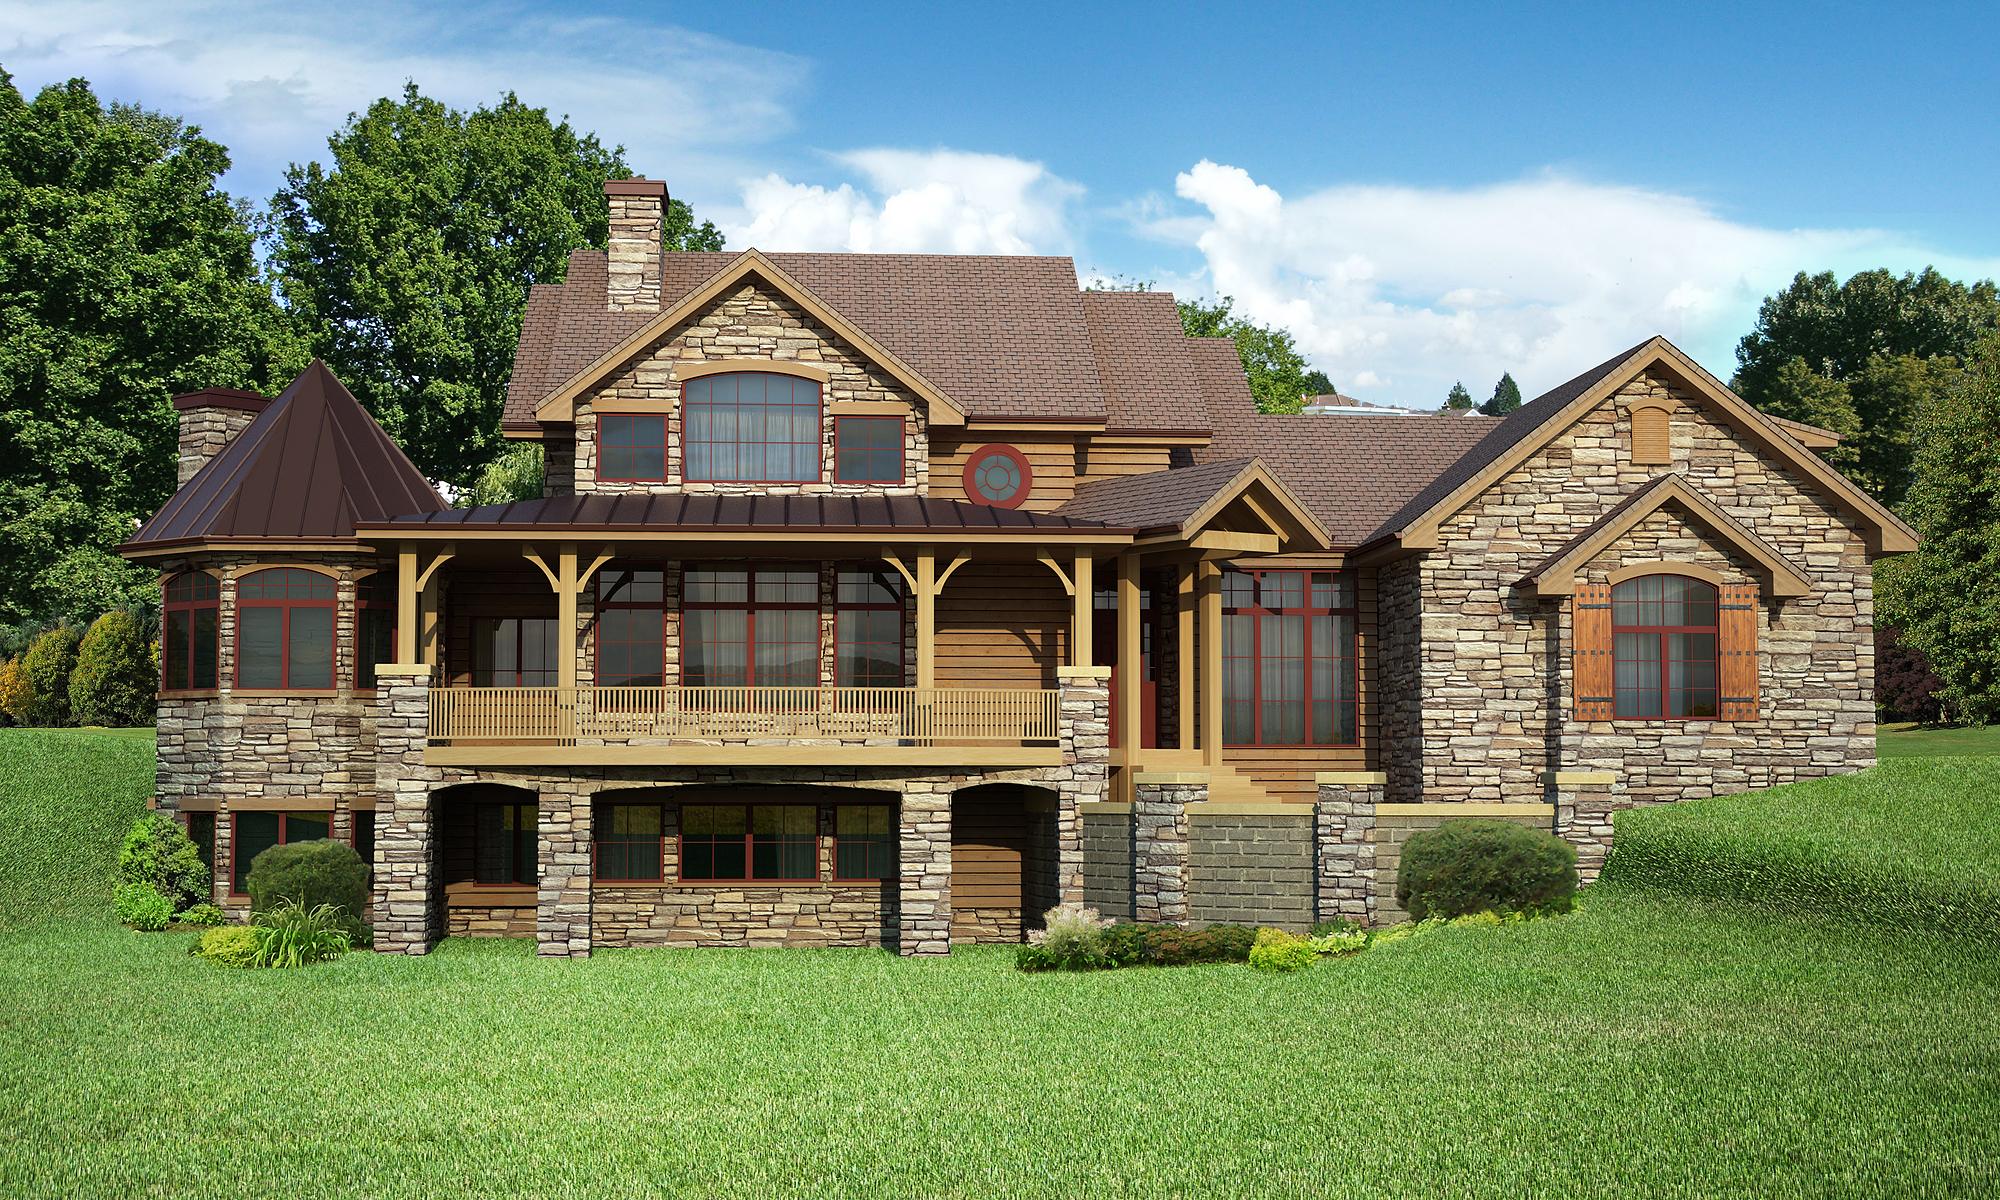 House Plan #161-1057: 4 Bdrm, 4,410 Sq Ft Craftsman Home